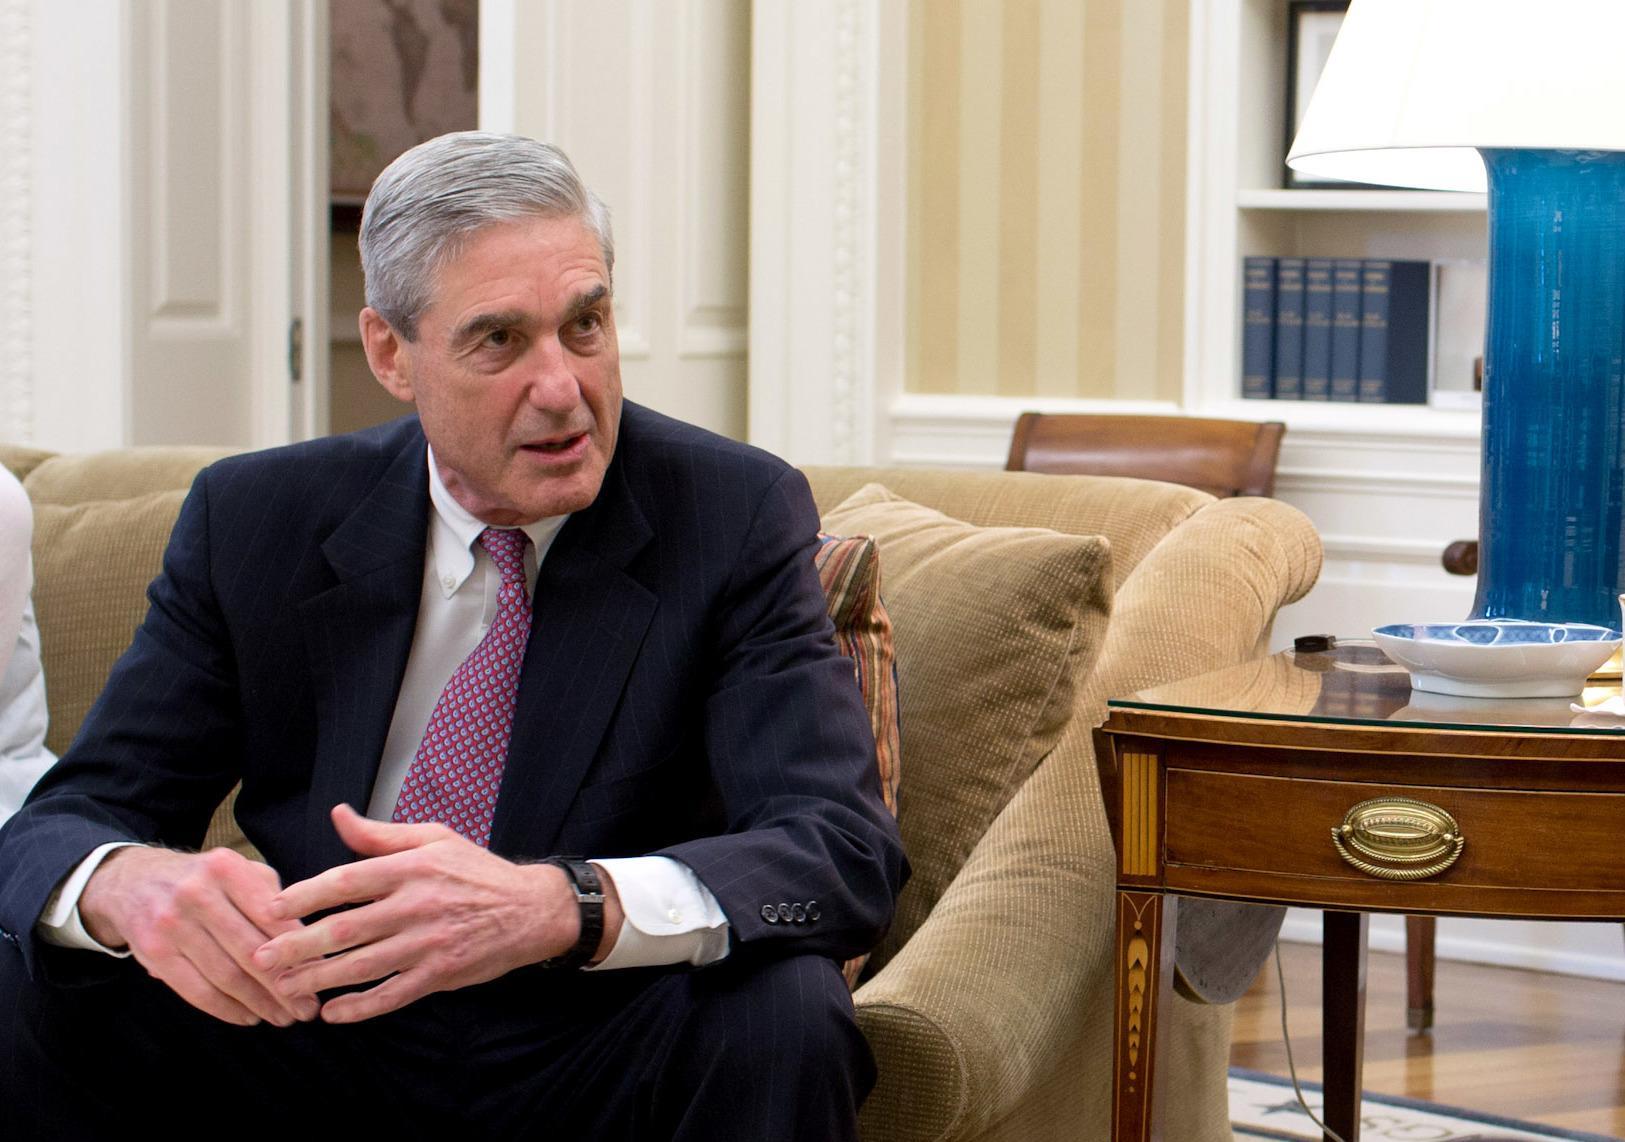 First arrests from Robert Mueller's investigation into election meddling